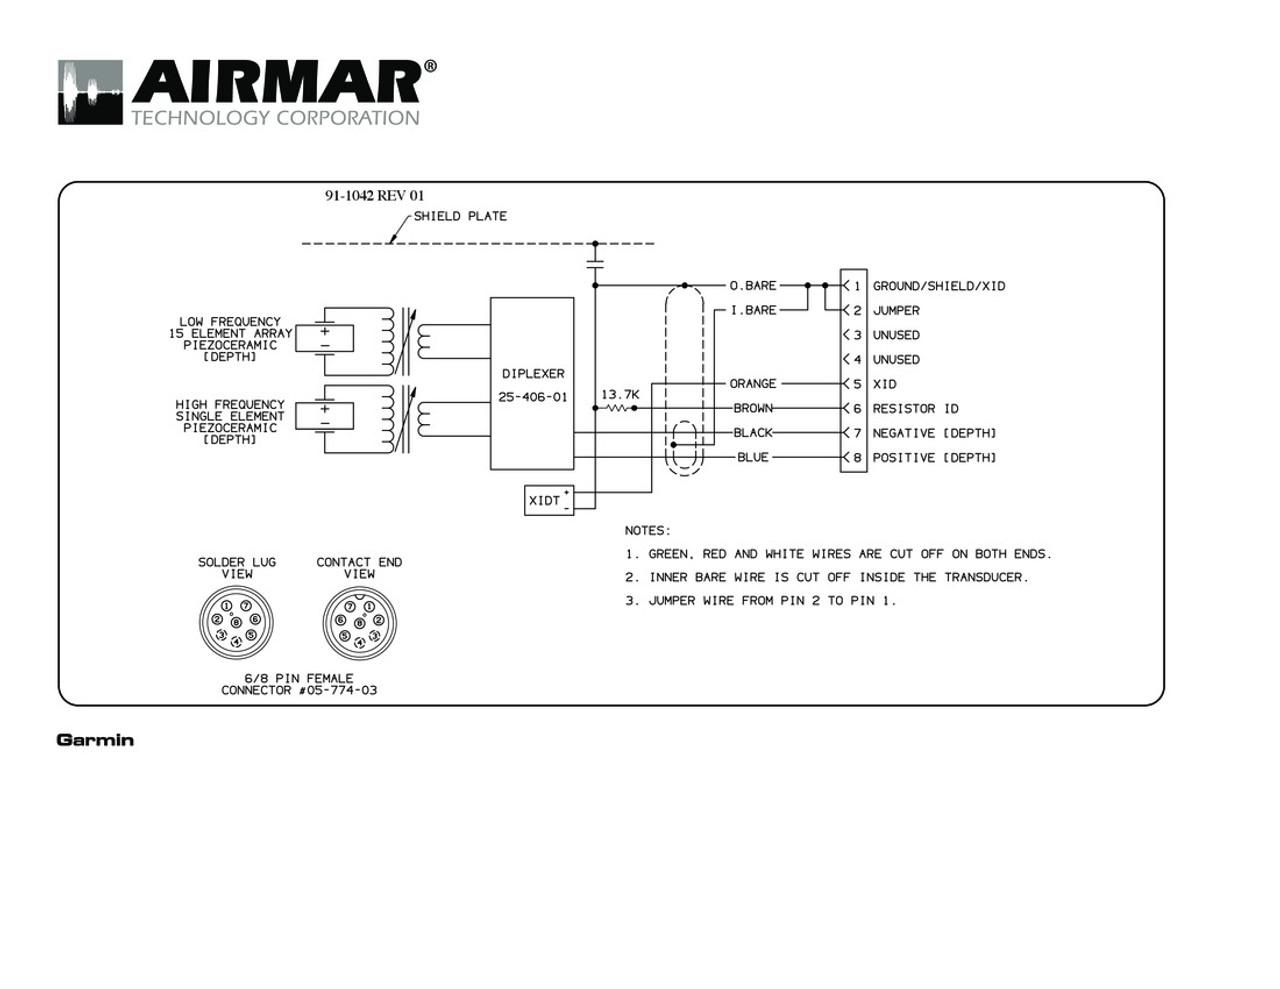 441s garmin wiring diagram wiring diagram todaysgarmin 441s gps wiring diagram wiring library braun wiring diagram 441s garmin wiring diagram